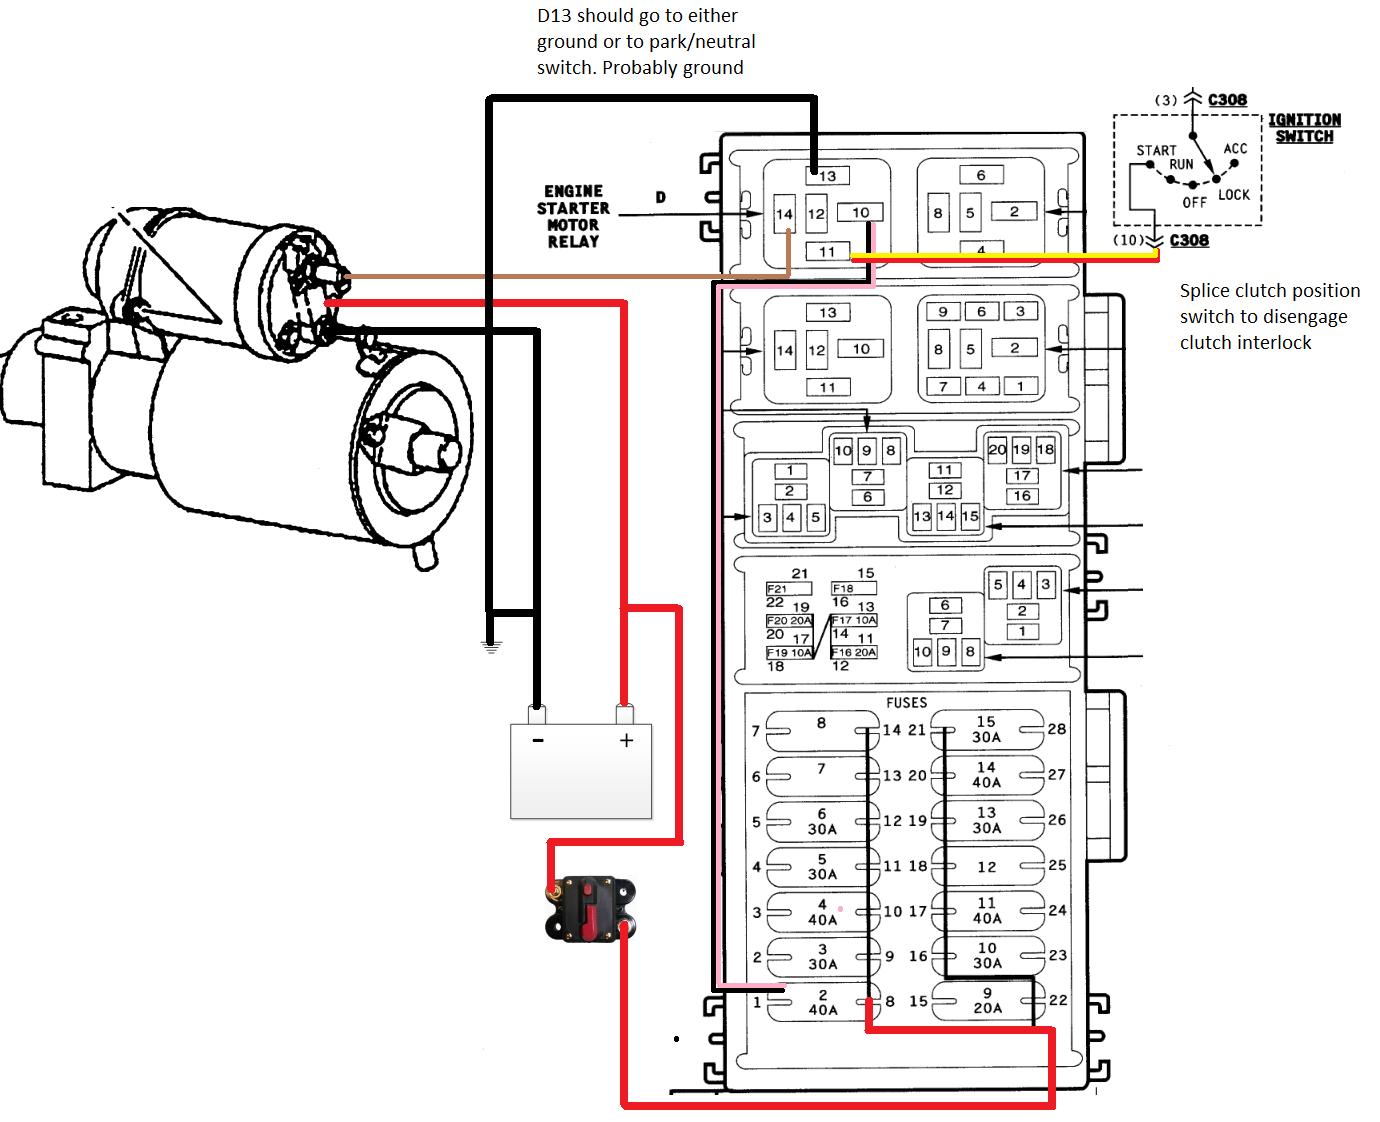 tj 5.3 lm7 swap - ignition wiring   jeep wrangler forum  jeep wrangler forum